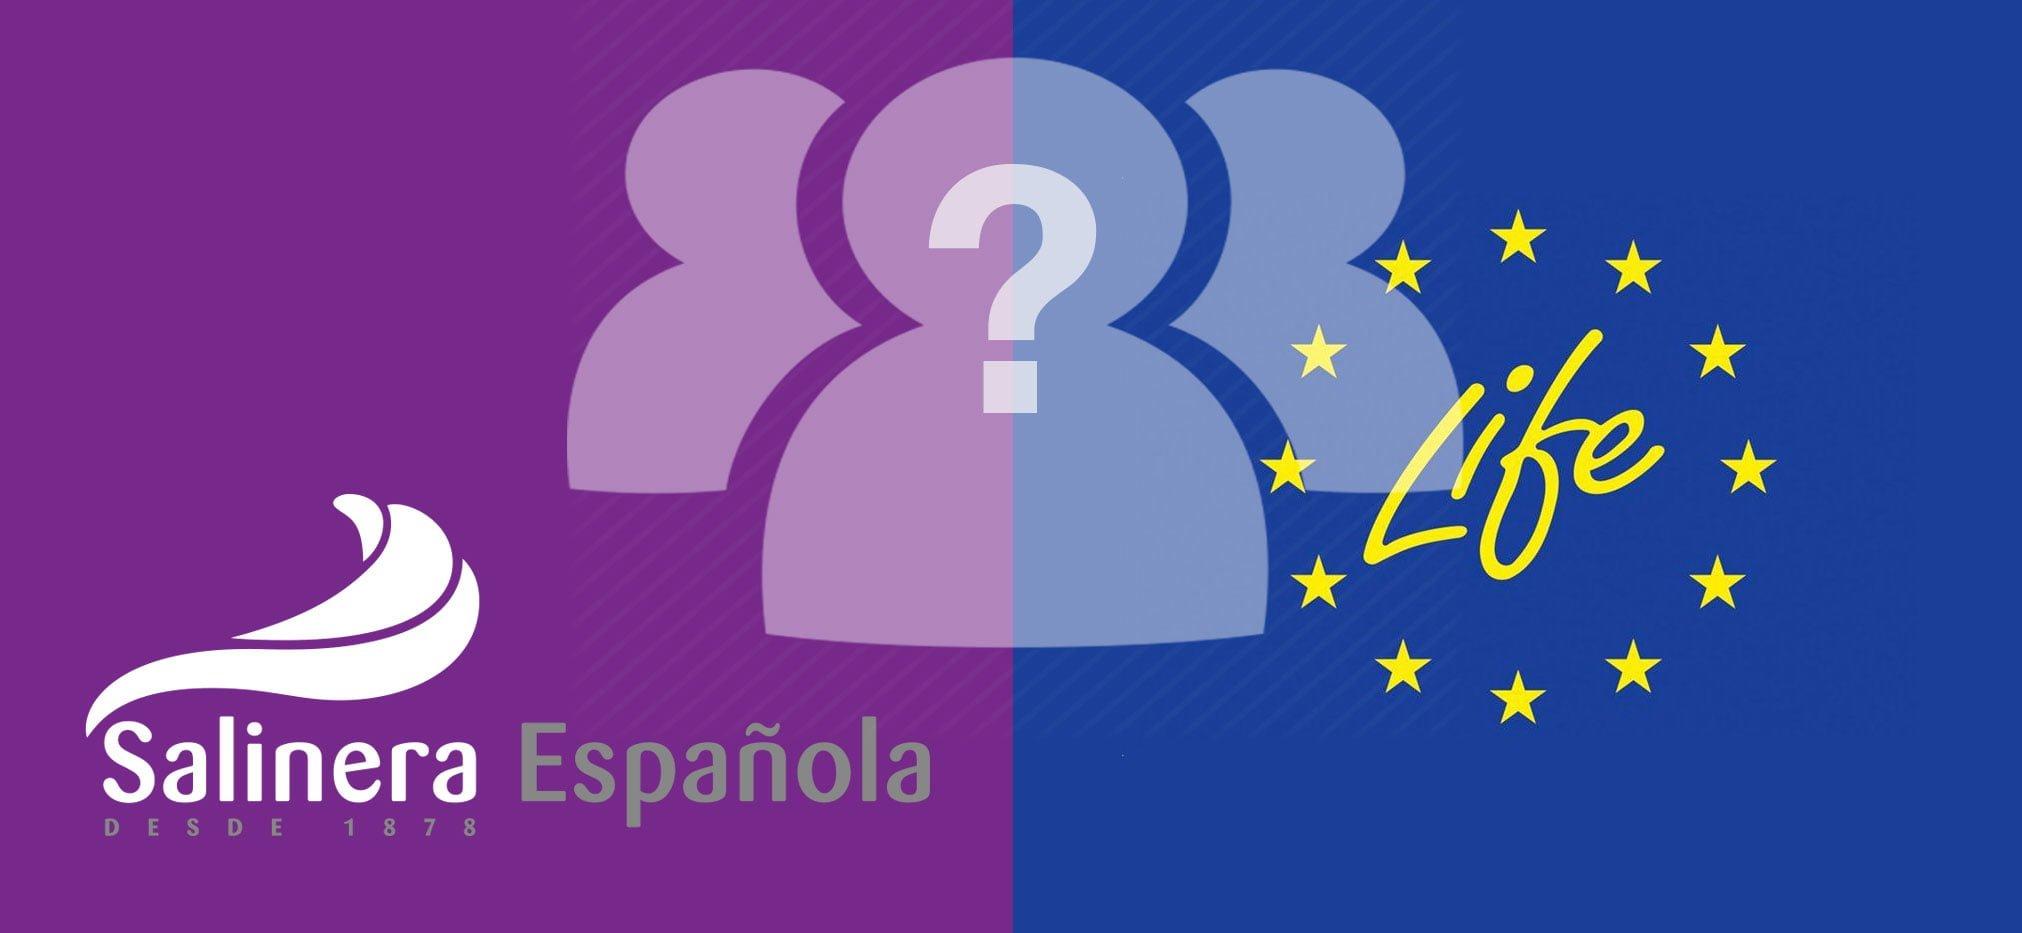 Oferta-de-empleo-Salinera-Espanola